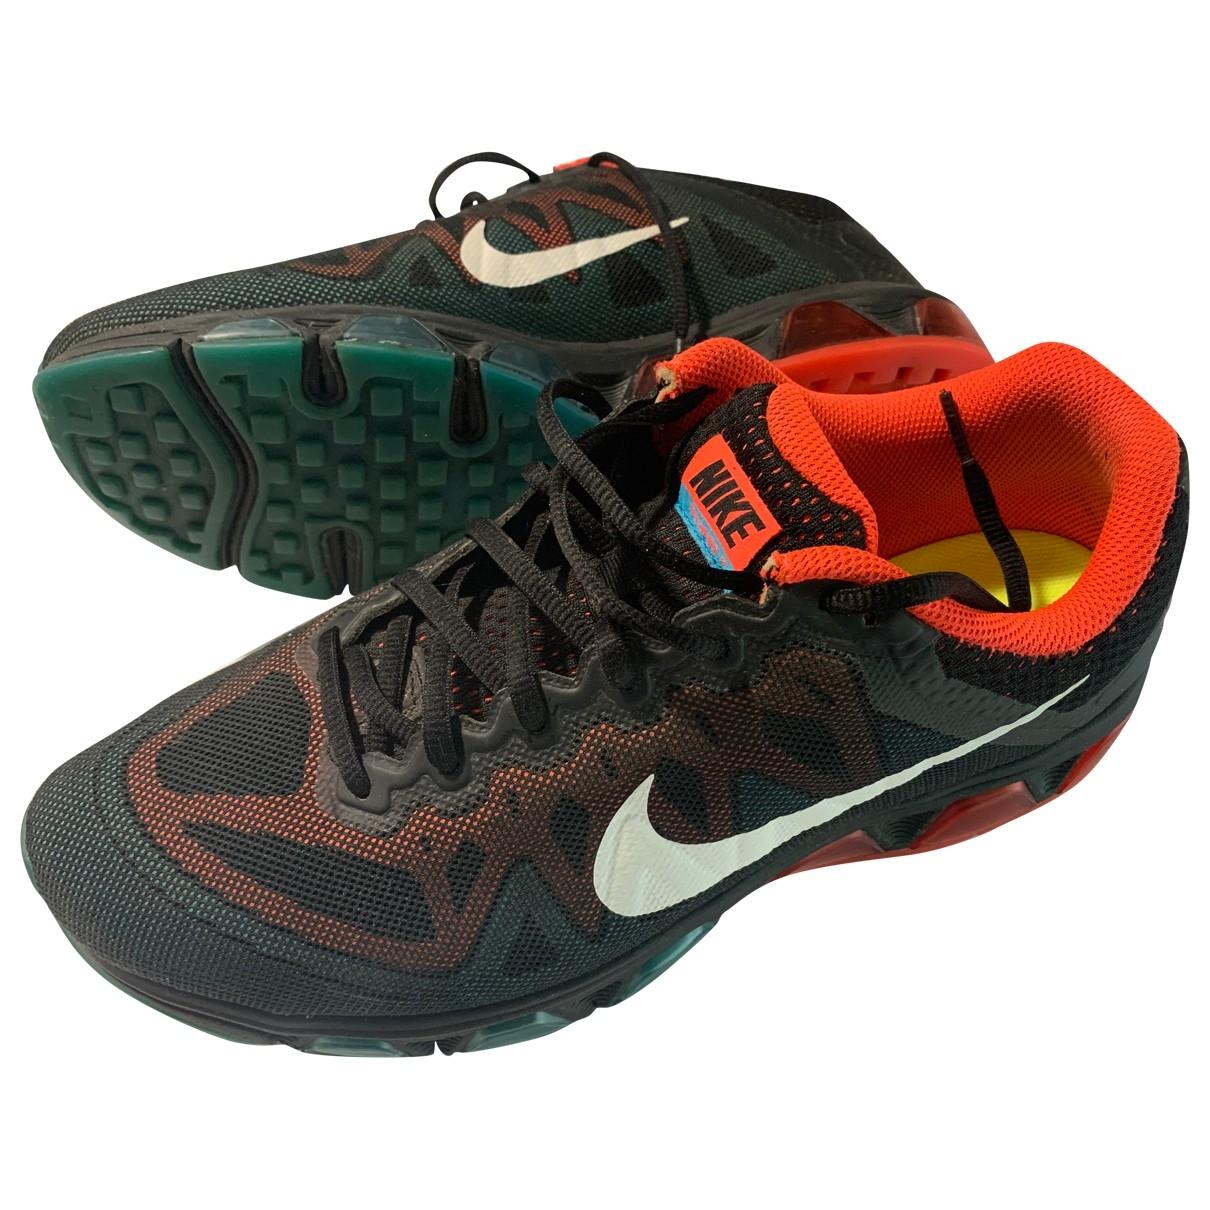 Nike Air Max  Black Cloth Trainers for Men 44.5 EU